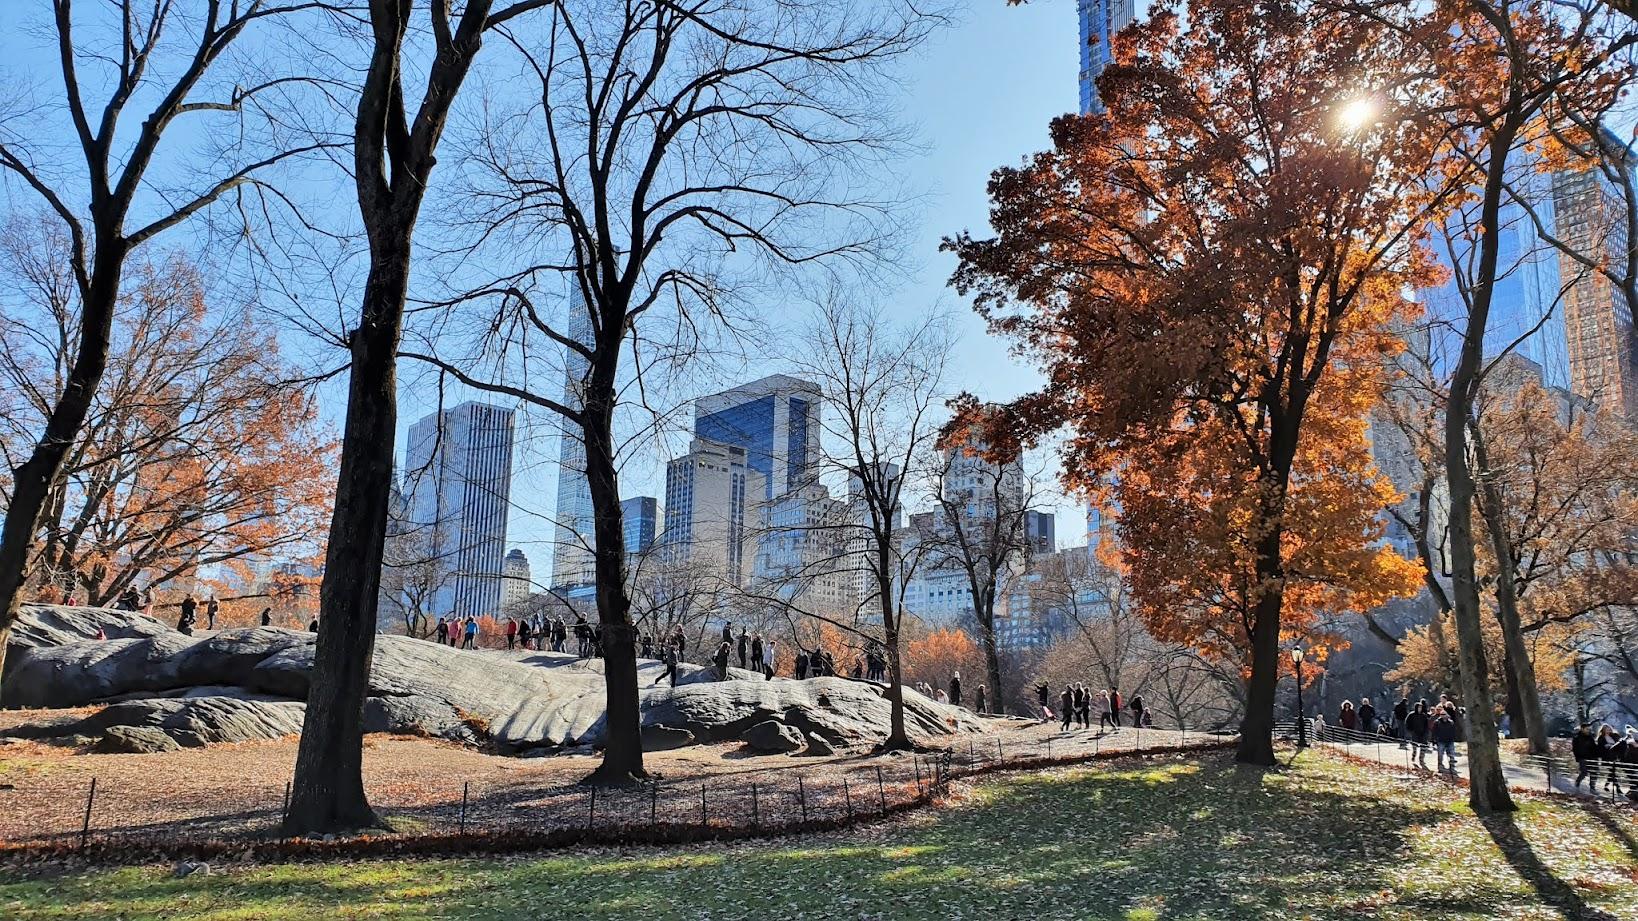 Umpire Rocks, Central Park, New York City